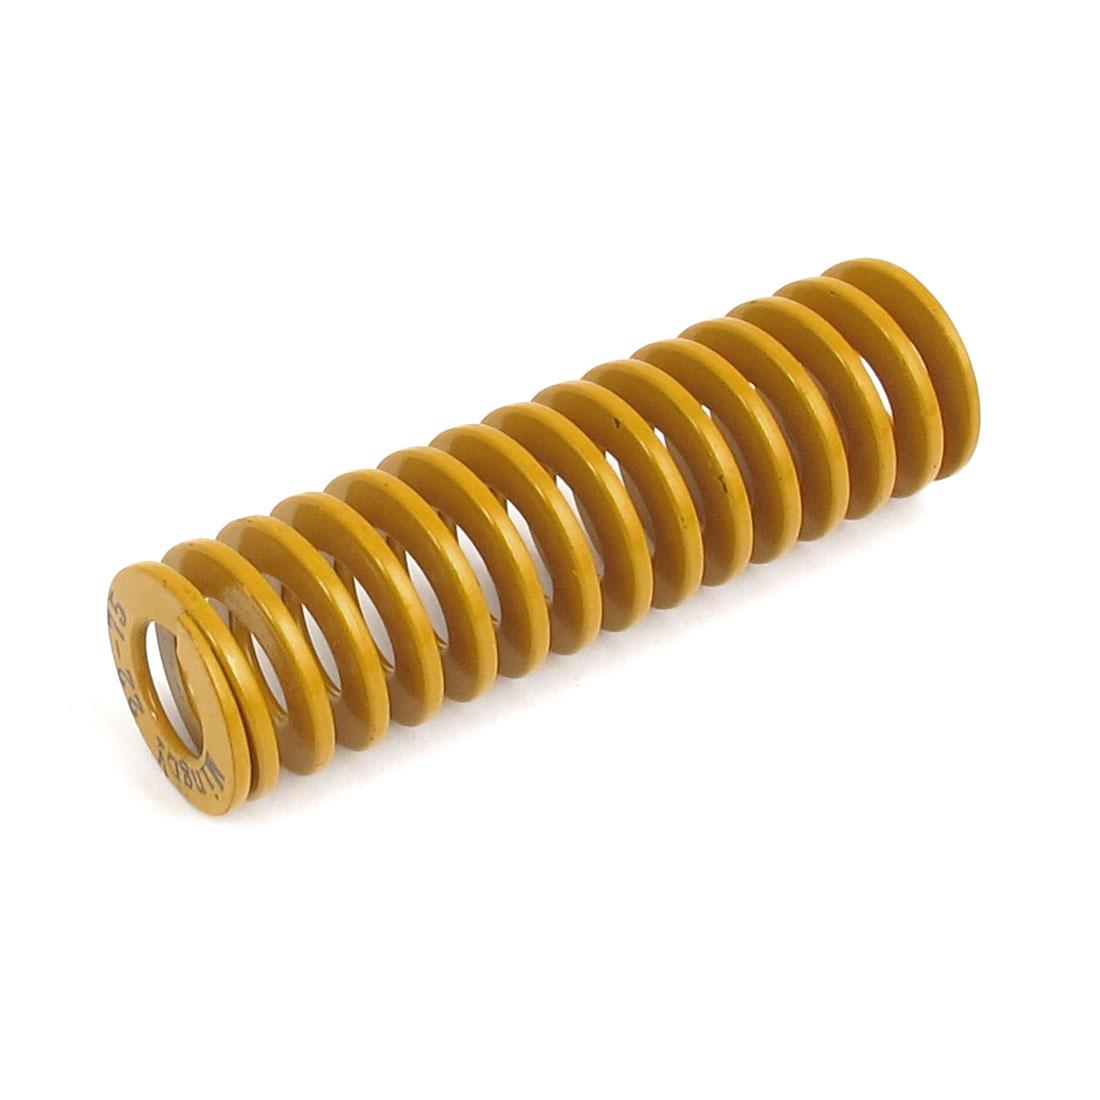 22mmx75mm Chromium Alloy Steel Lightest Load Die Spring Yellow